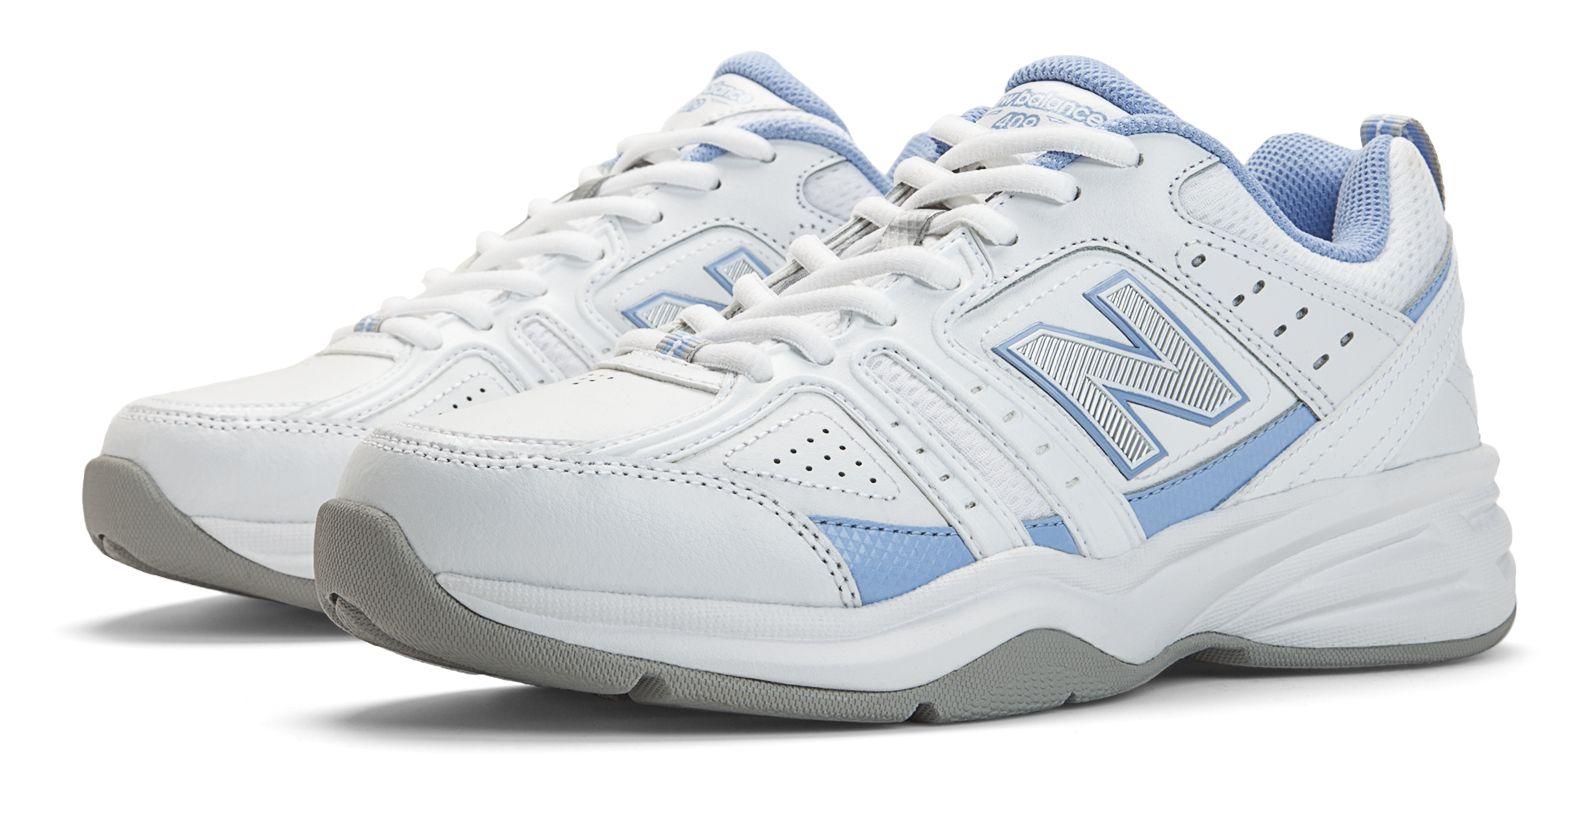 New Balance Womens 409v2 Cushioning Cross Trainers Shoes